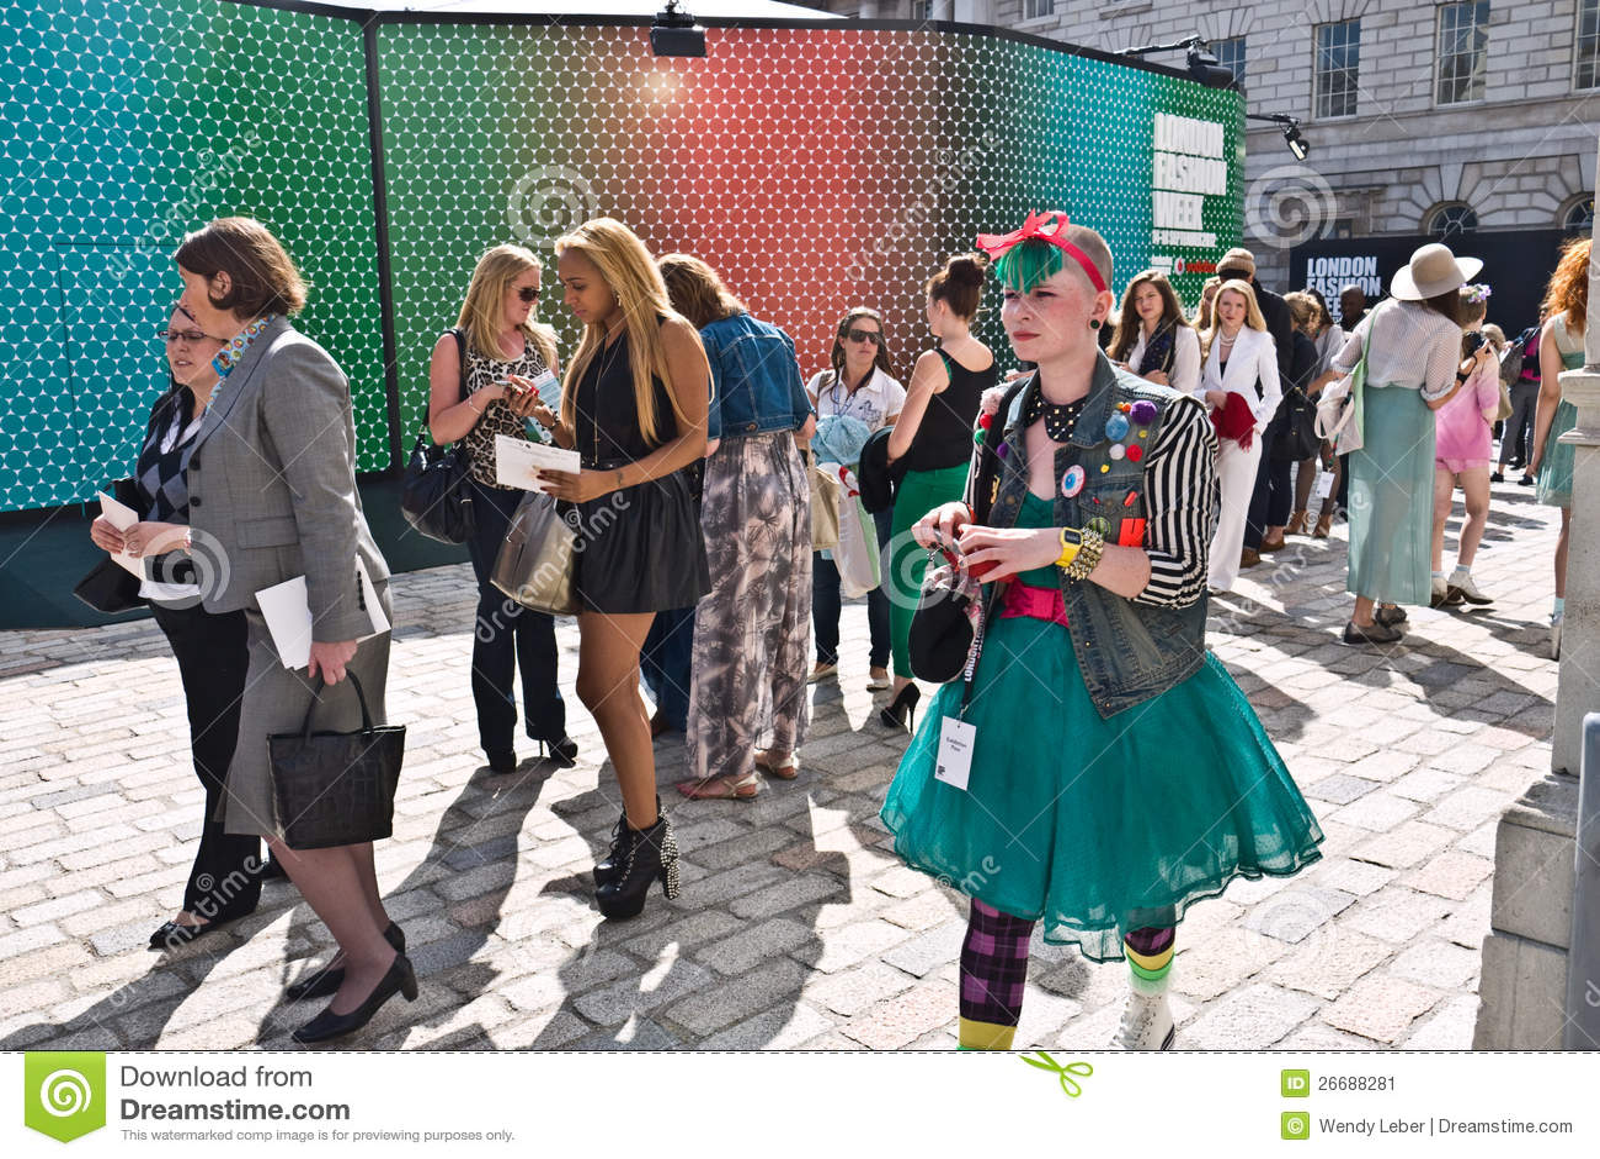 London Fashion Week At Somerset House Editorial Photo Image 26688281